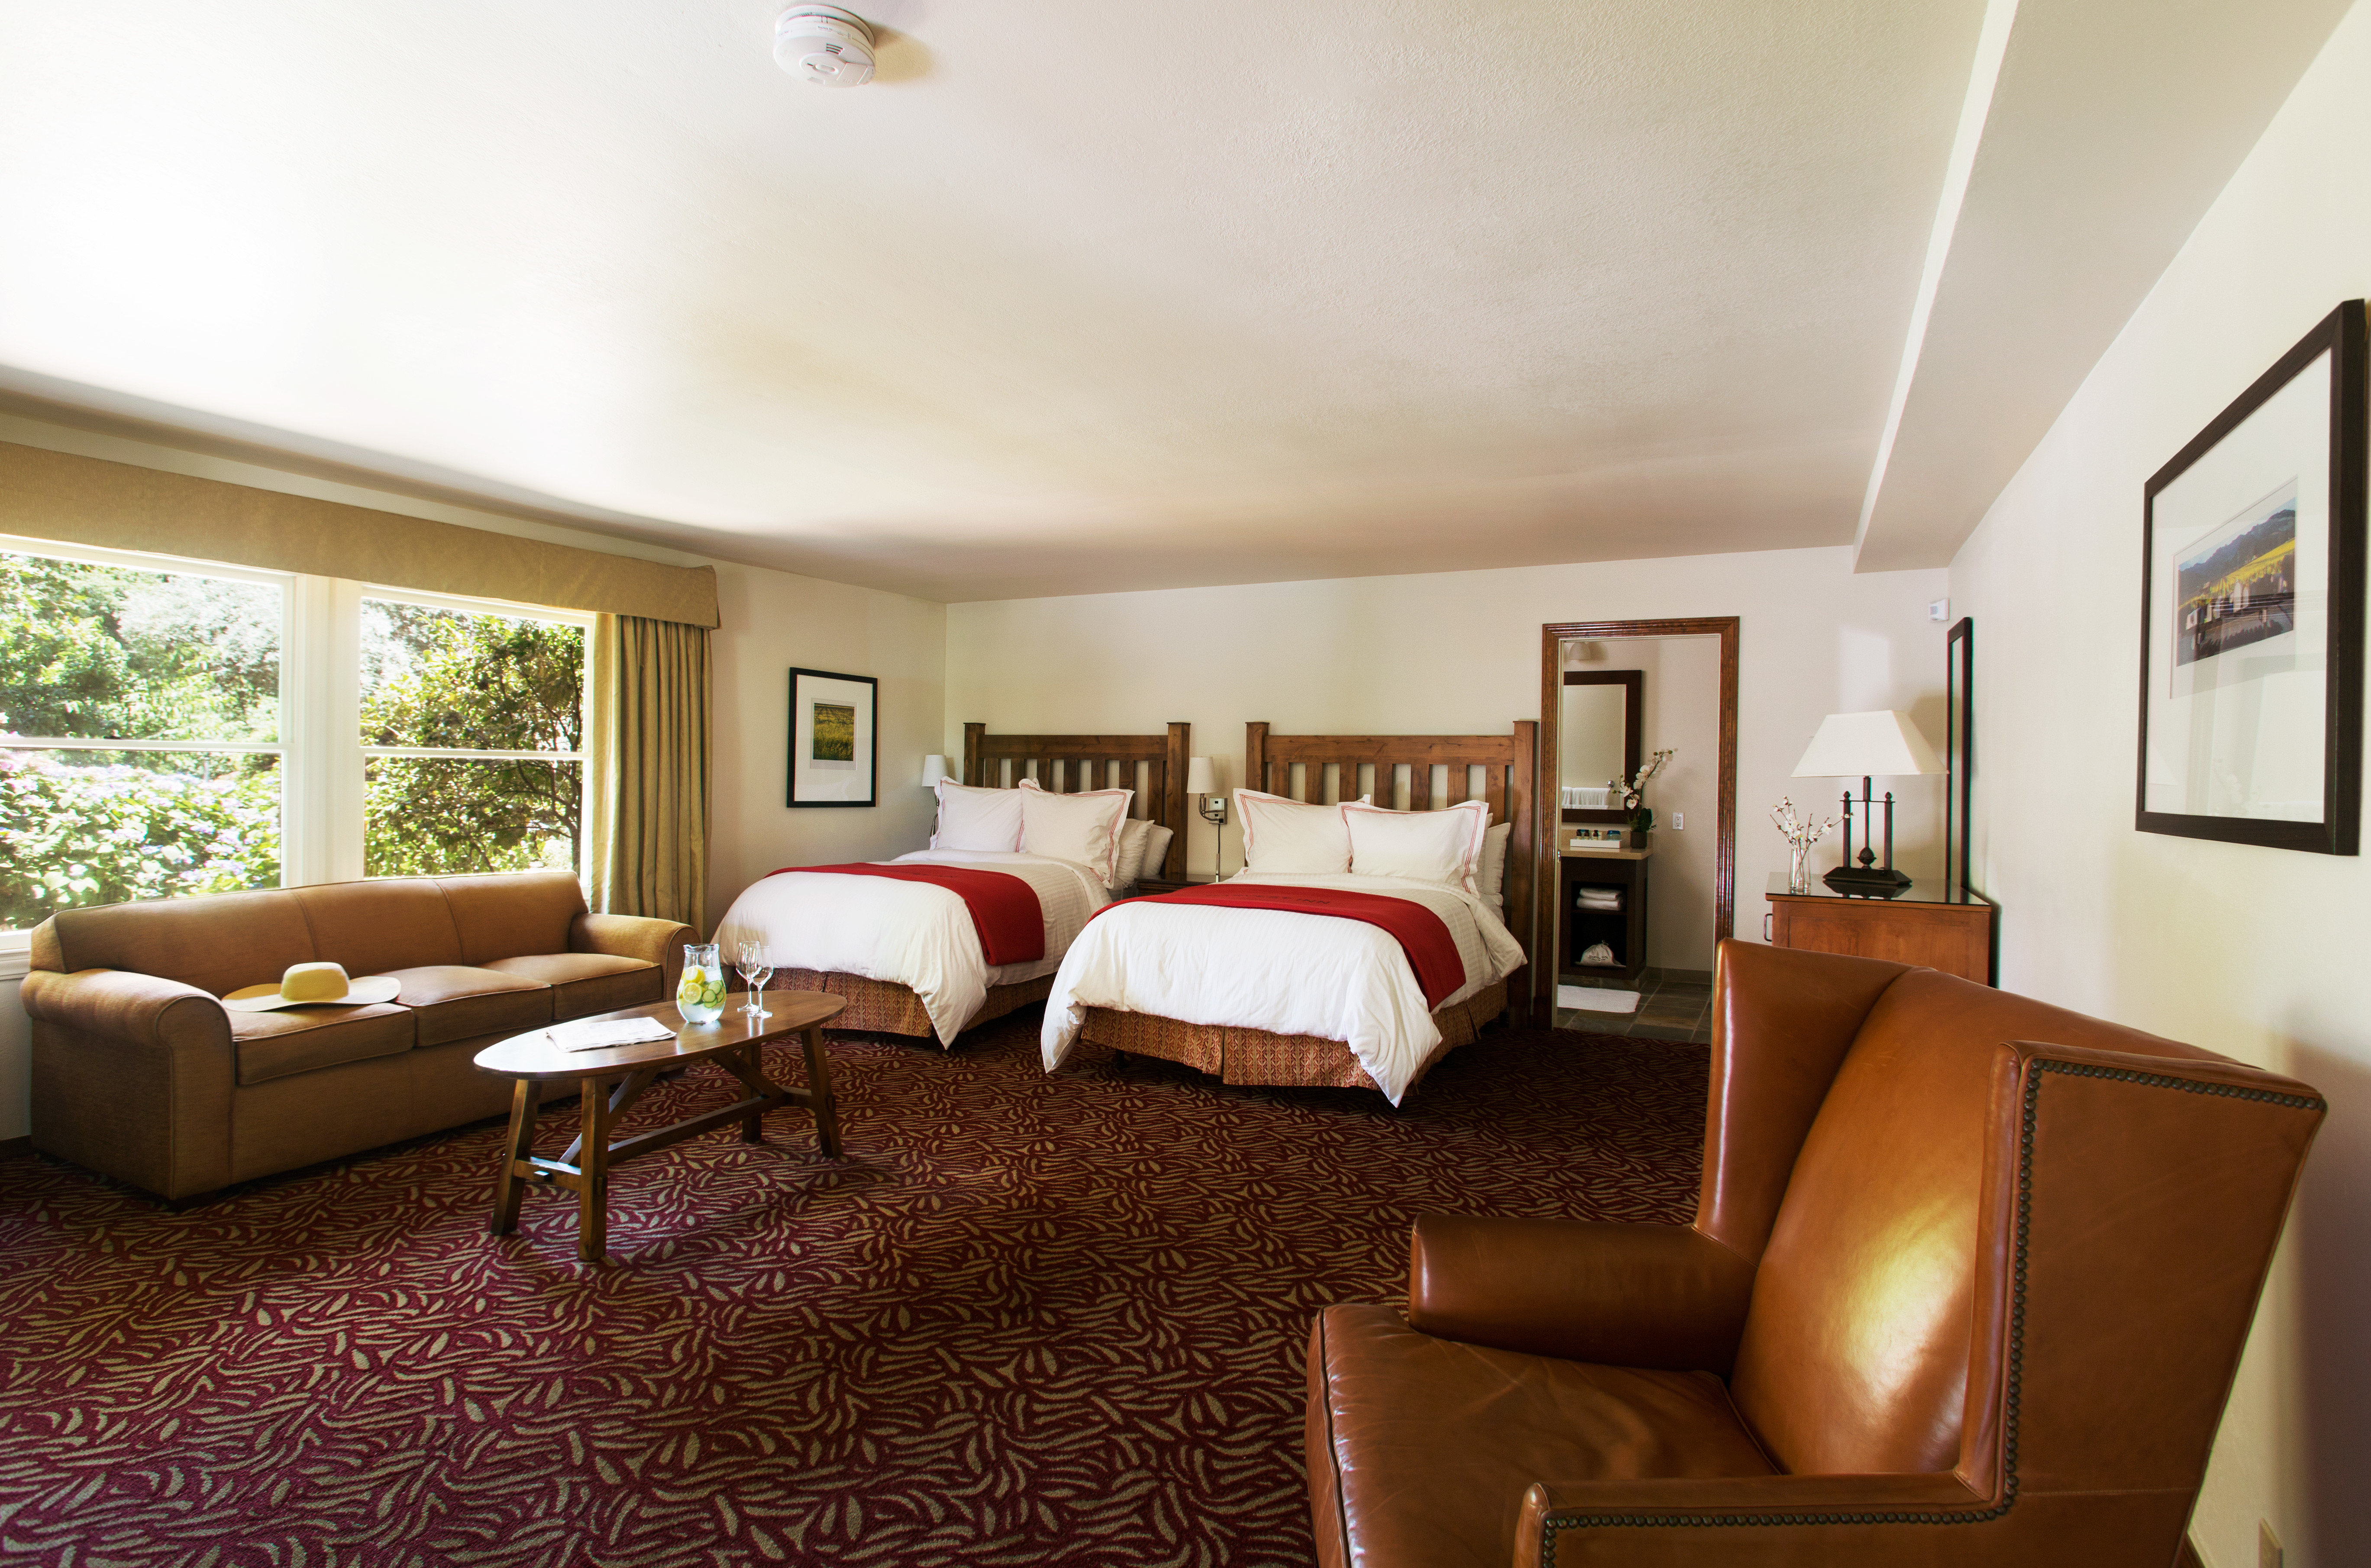 Bedroom Inn Romantic Scenic views property living room Suite home cottage condominium Villa